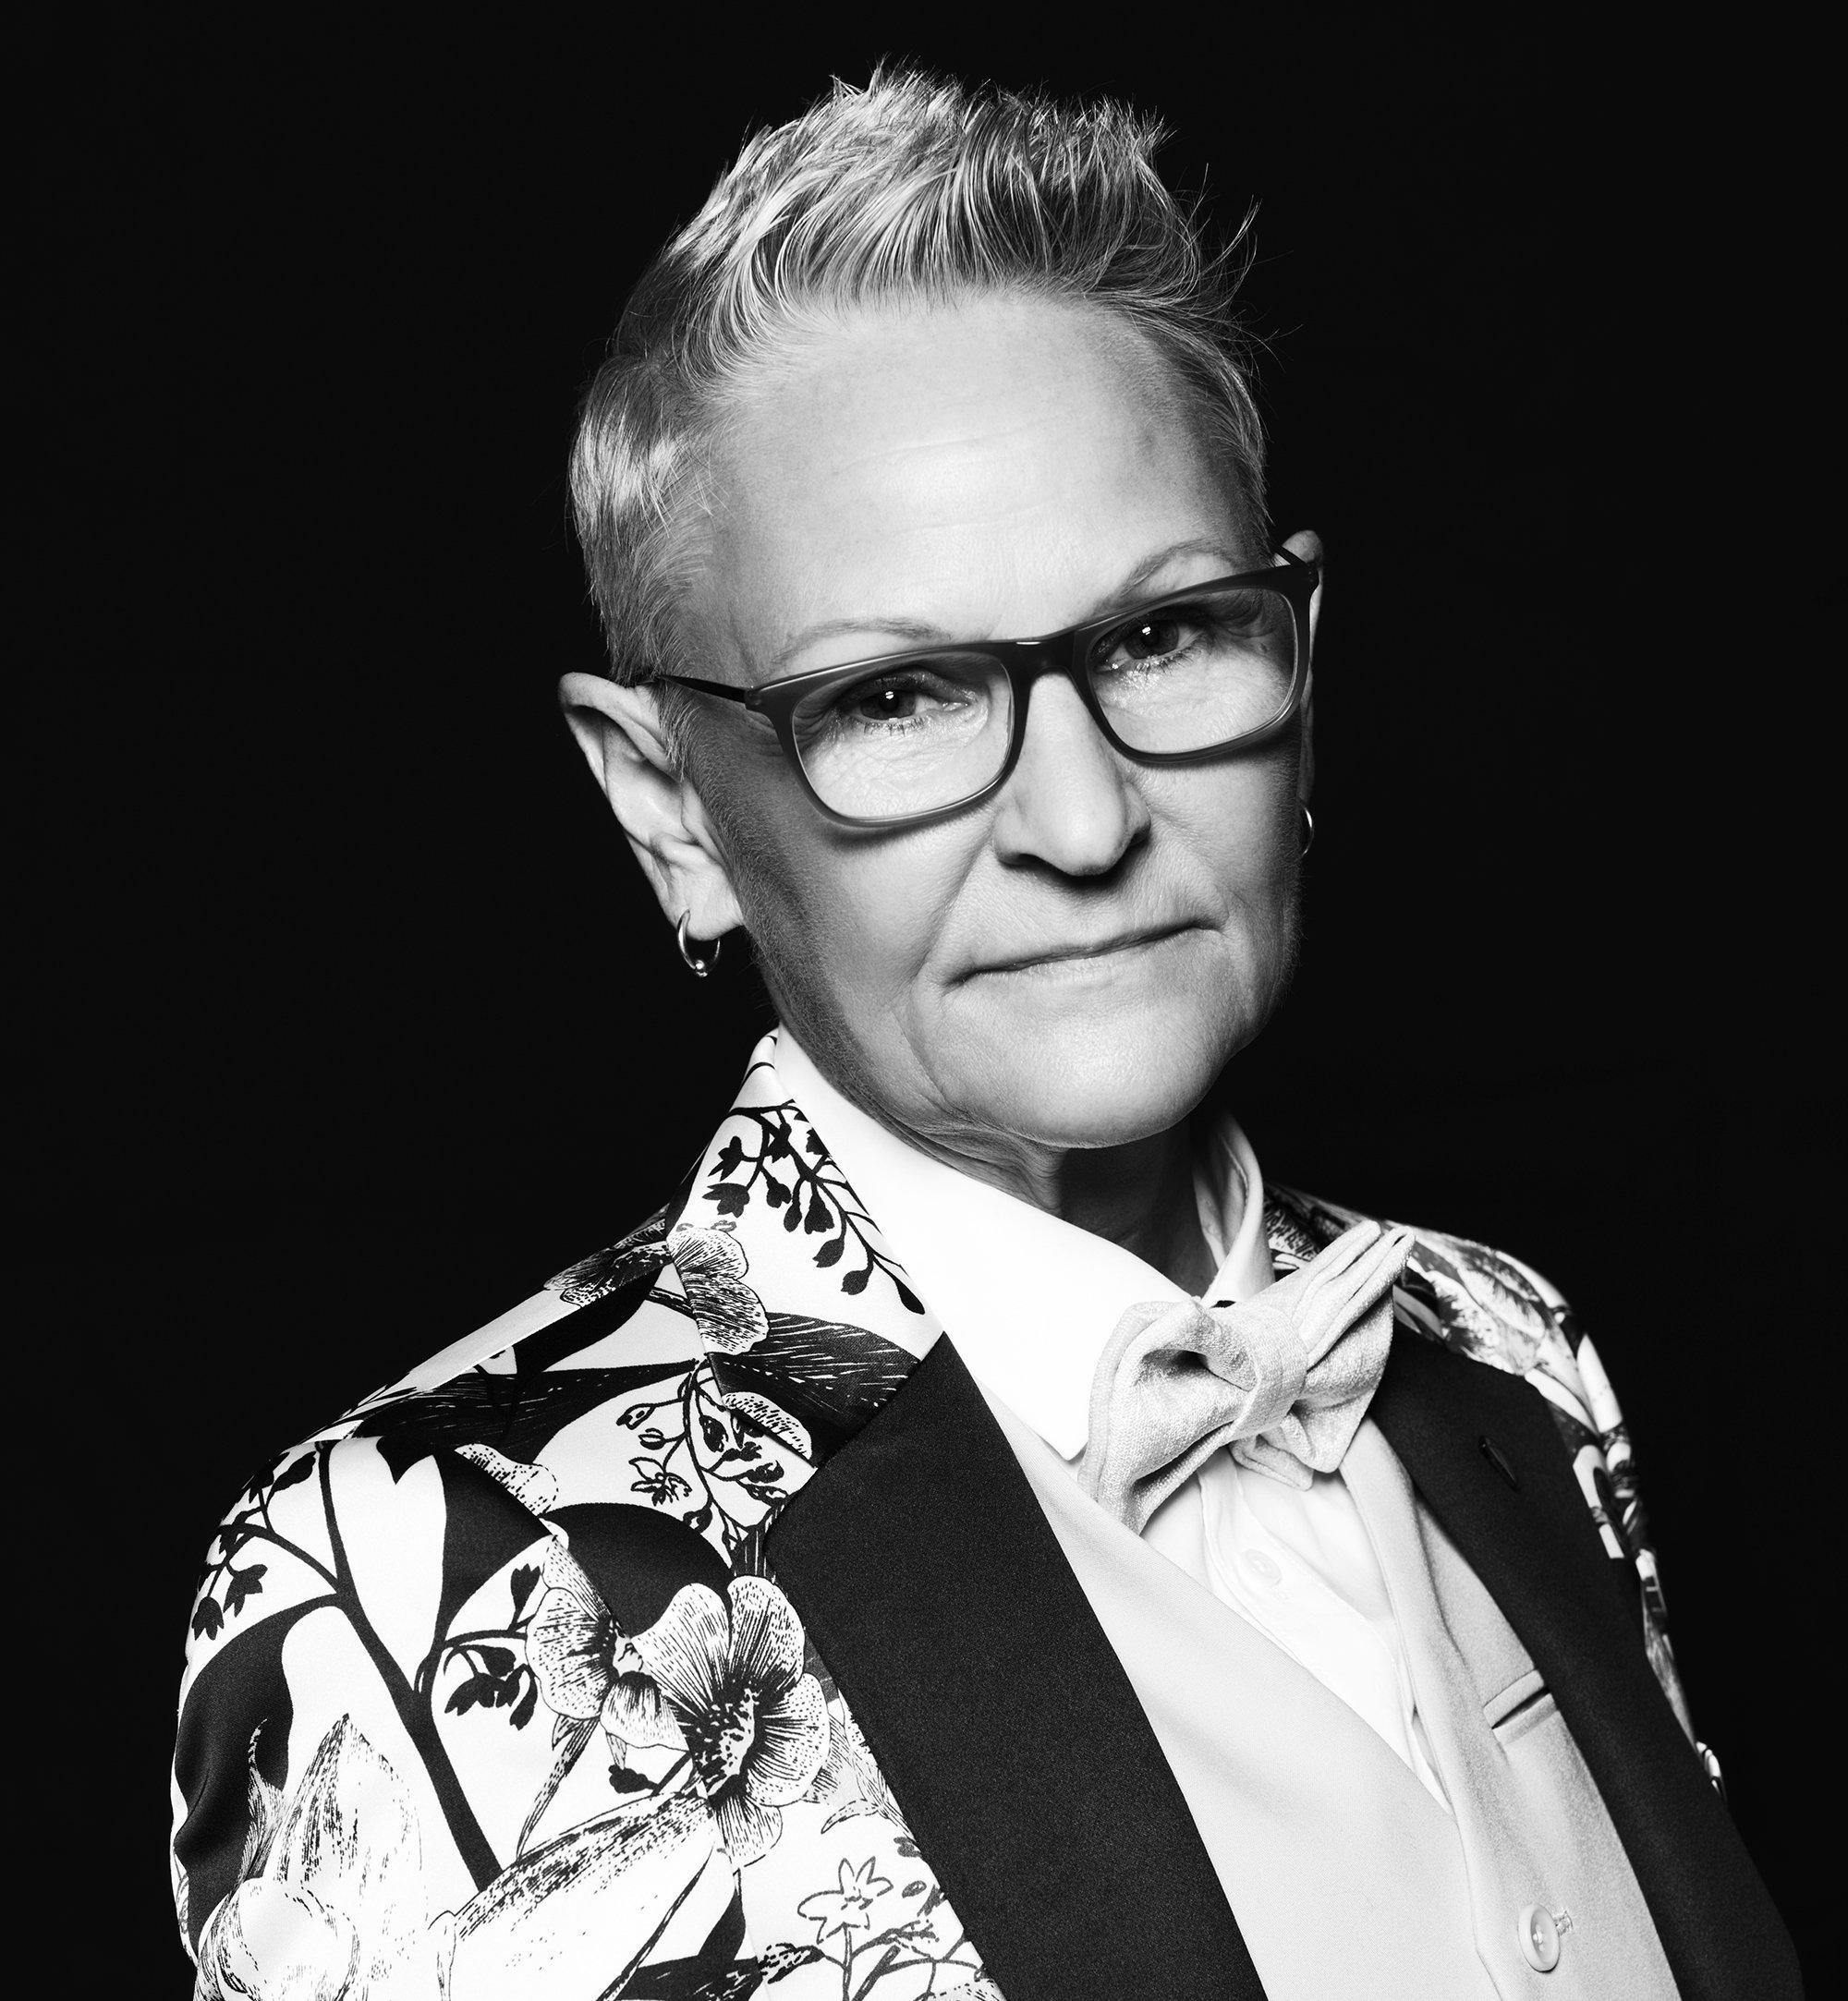 Portrait of tattoo artist Kari Barba, photo by Greg Conraux